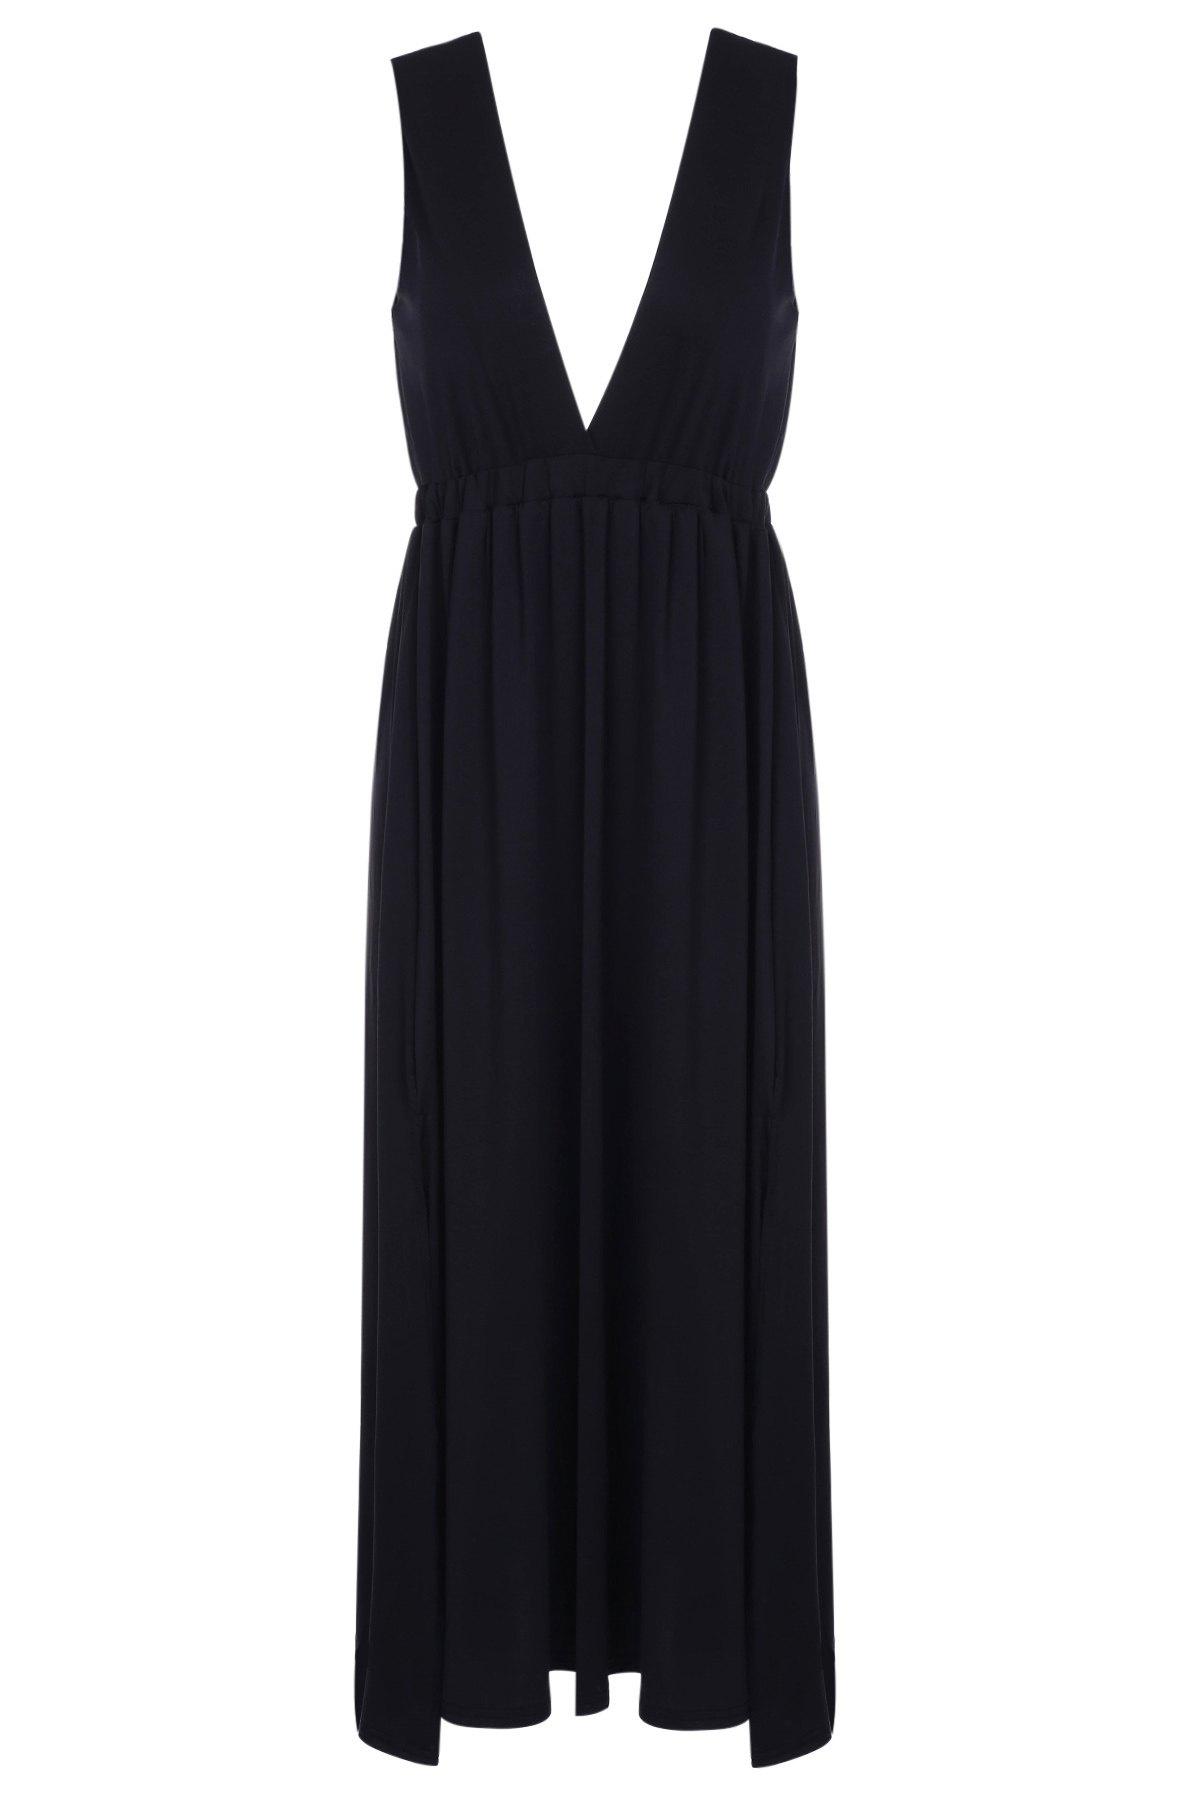 Plunging Neck Black Backless Sleeveless Dress